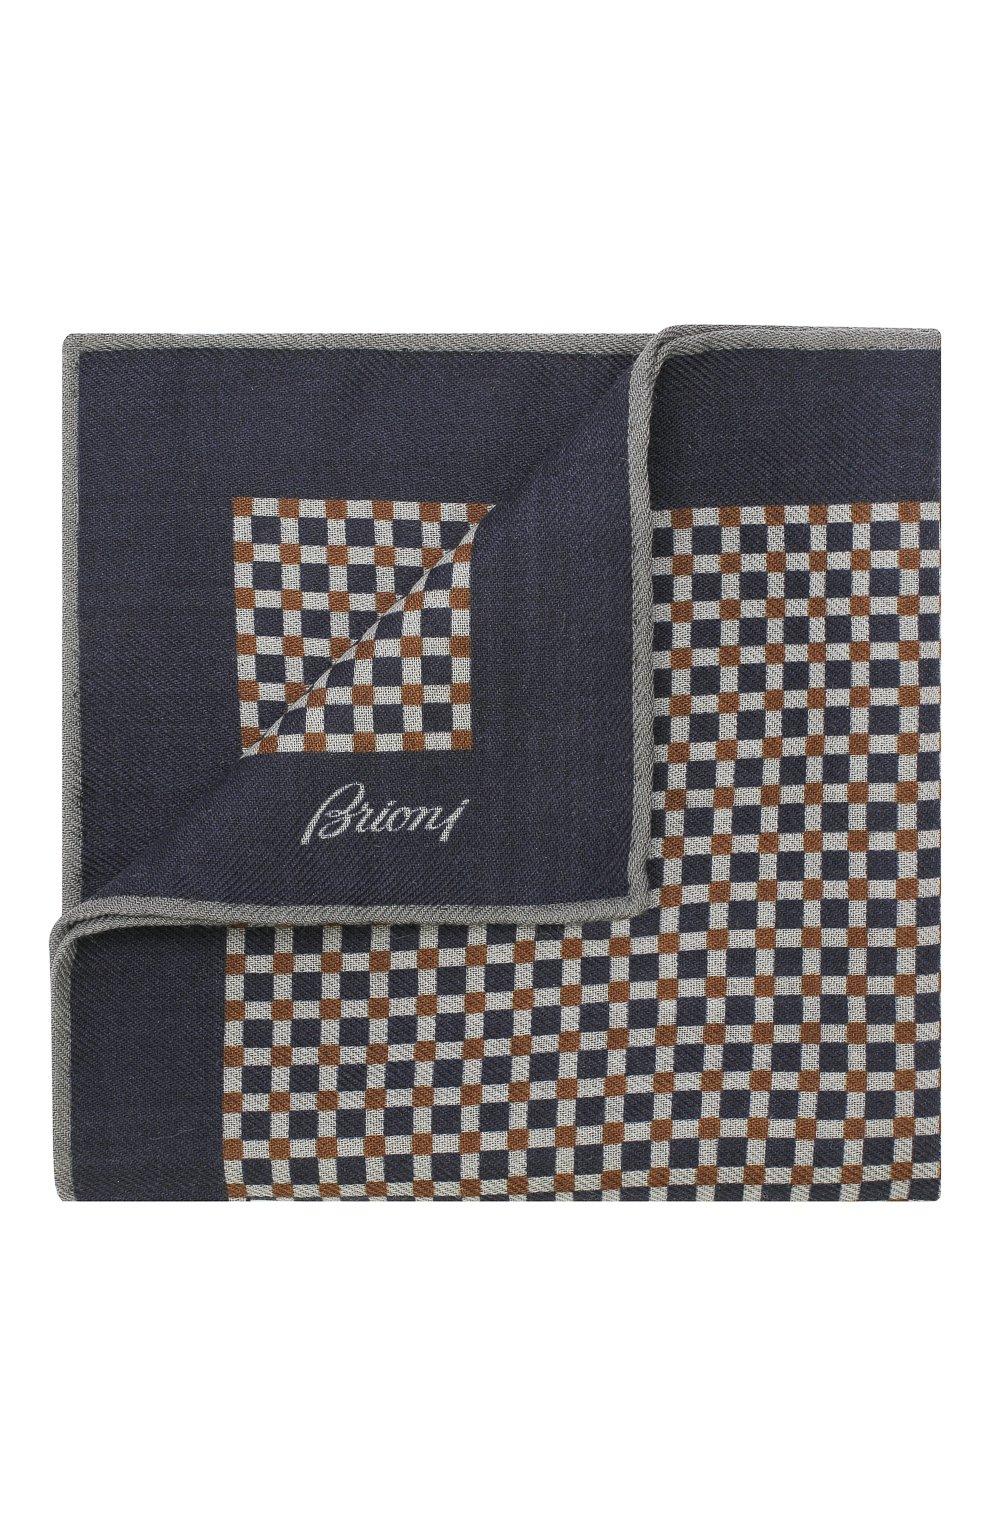 Мужской платок из смеси шерсти и шелка BRIONI синего цвета, арт. 071000/08A9G   Фото 1